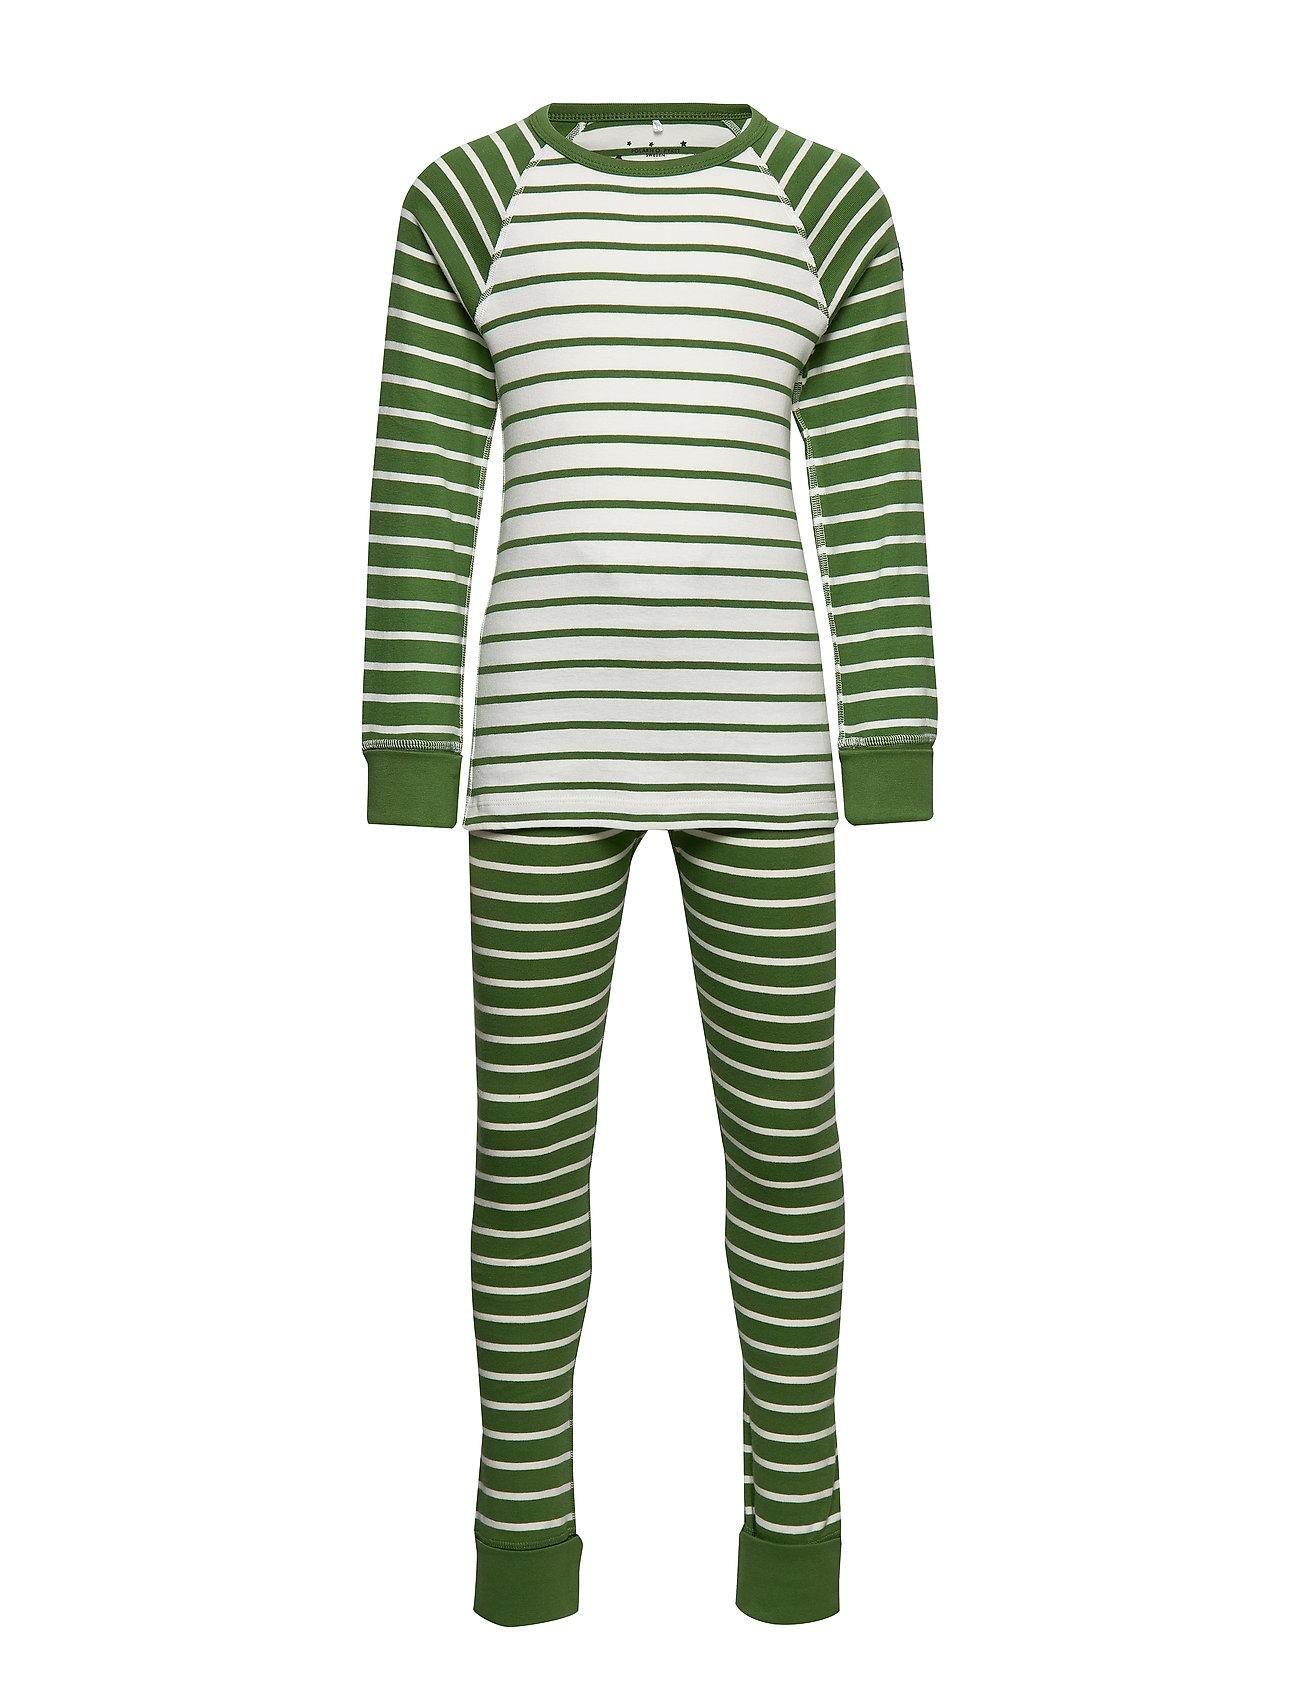 Polarn O. Pyret Pyjamas Striped School - WILLOW BOUGH